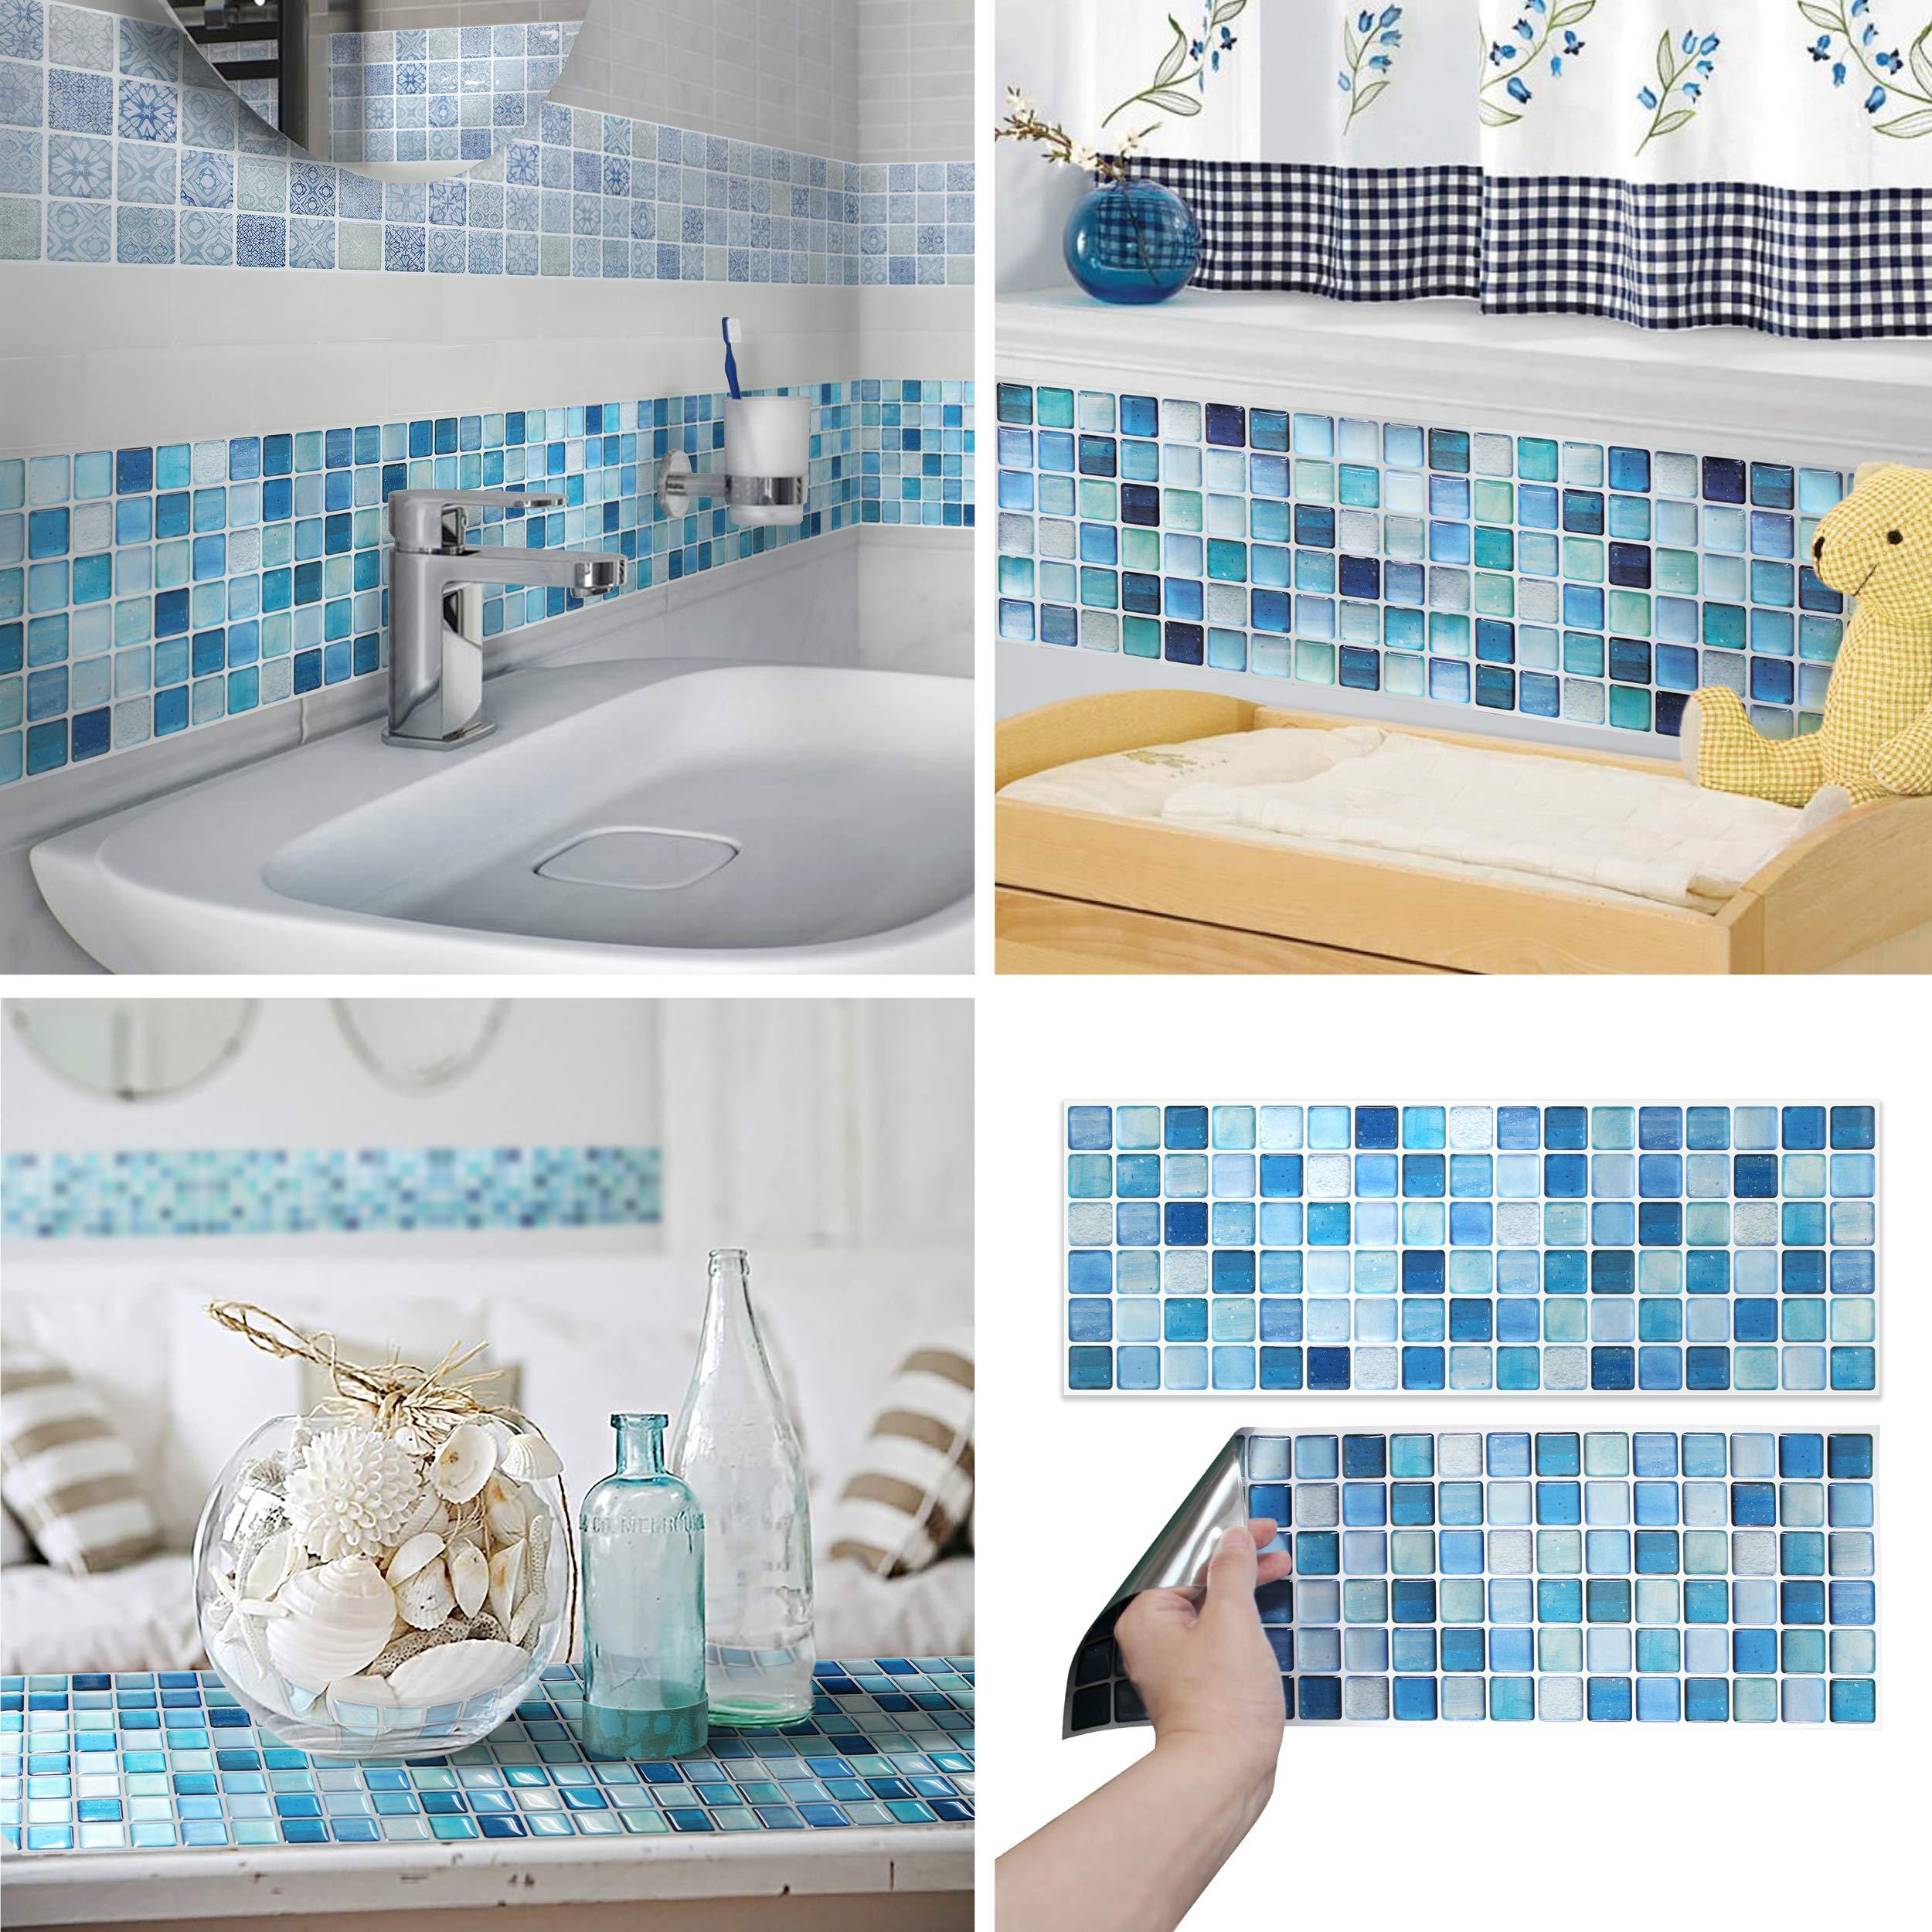 BEAUSTILE Decorative Tile Stickers Peel and Stick Backsplash Fire Retardant Tile Sheet (N.Blue) (10, 5.28'' x 14.8'') by BEAUS TILE (Image #1)